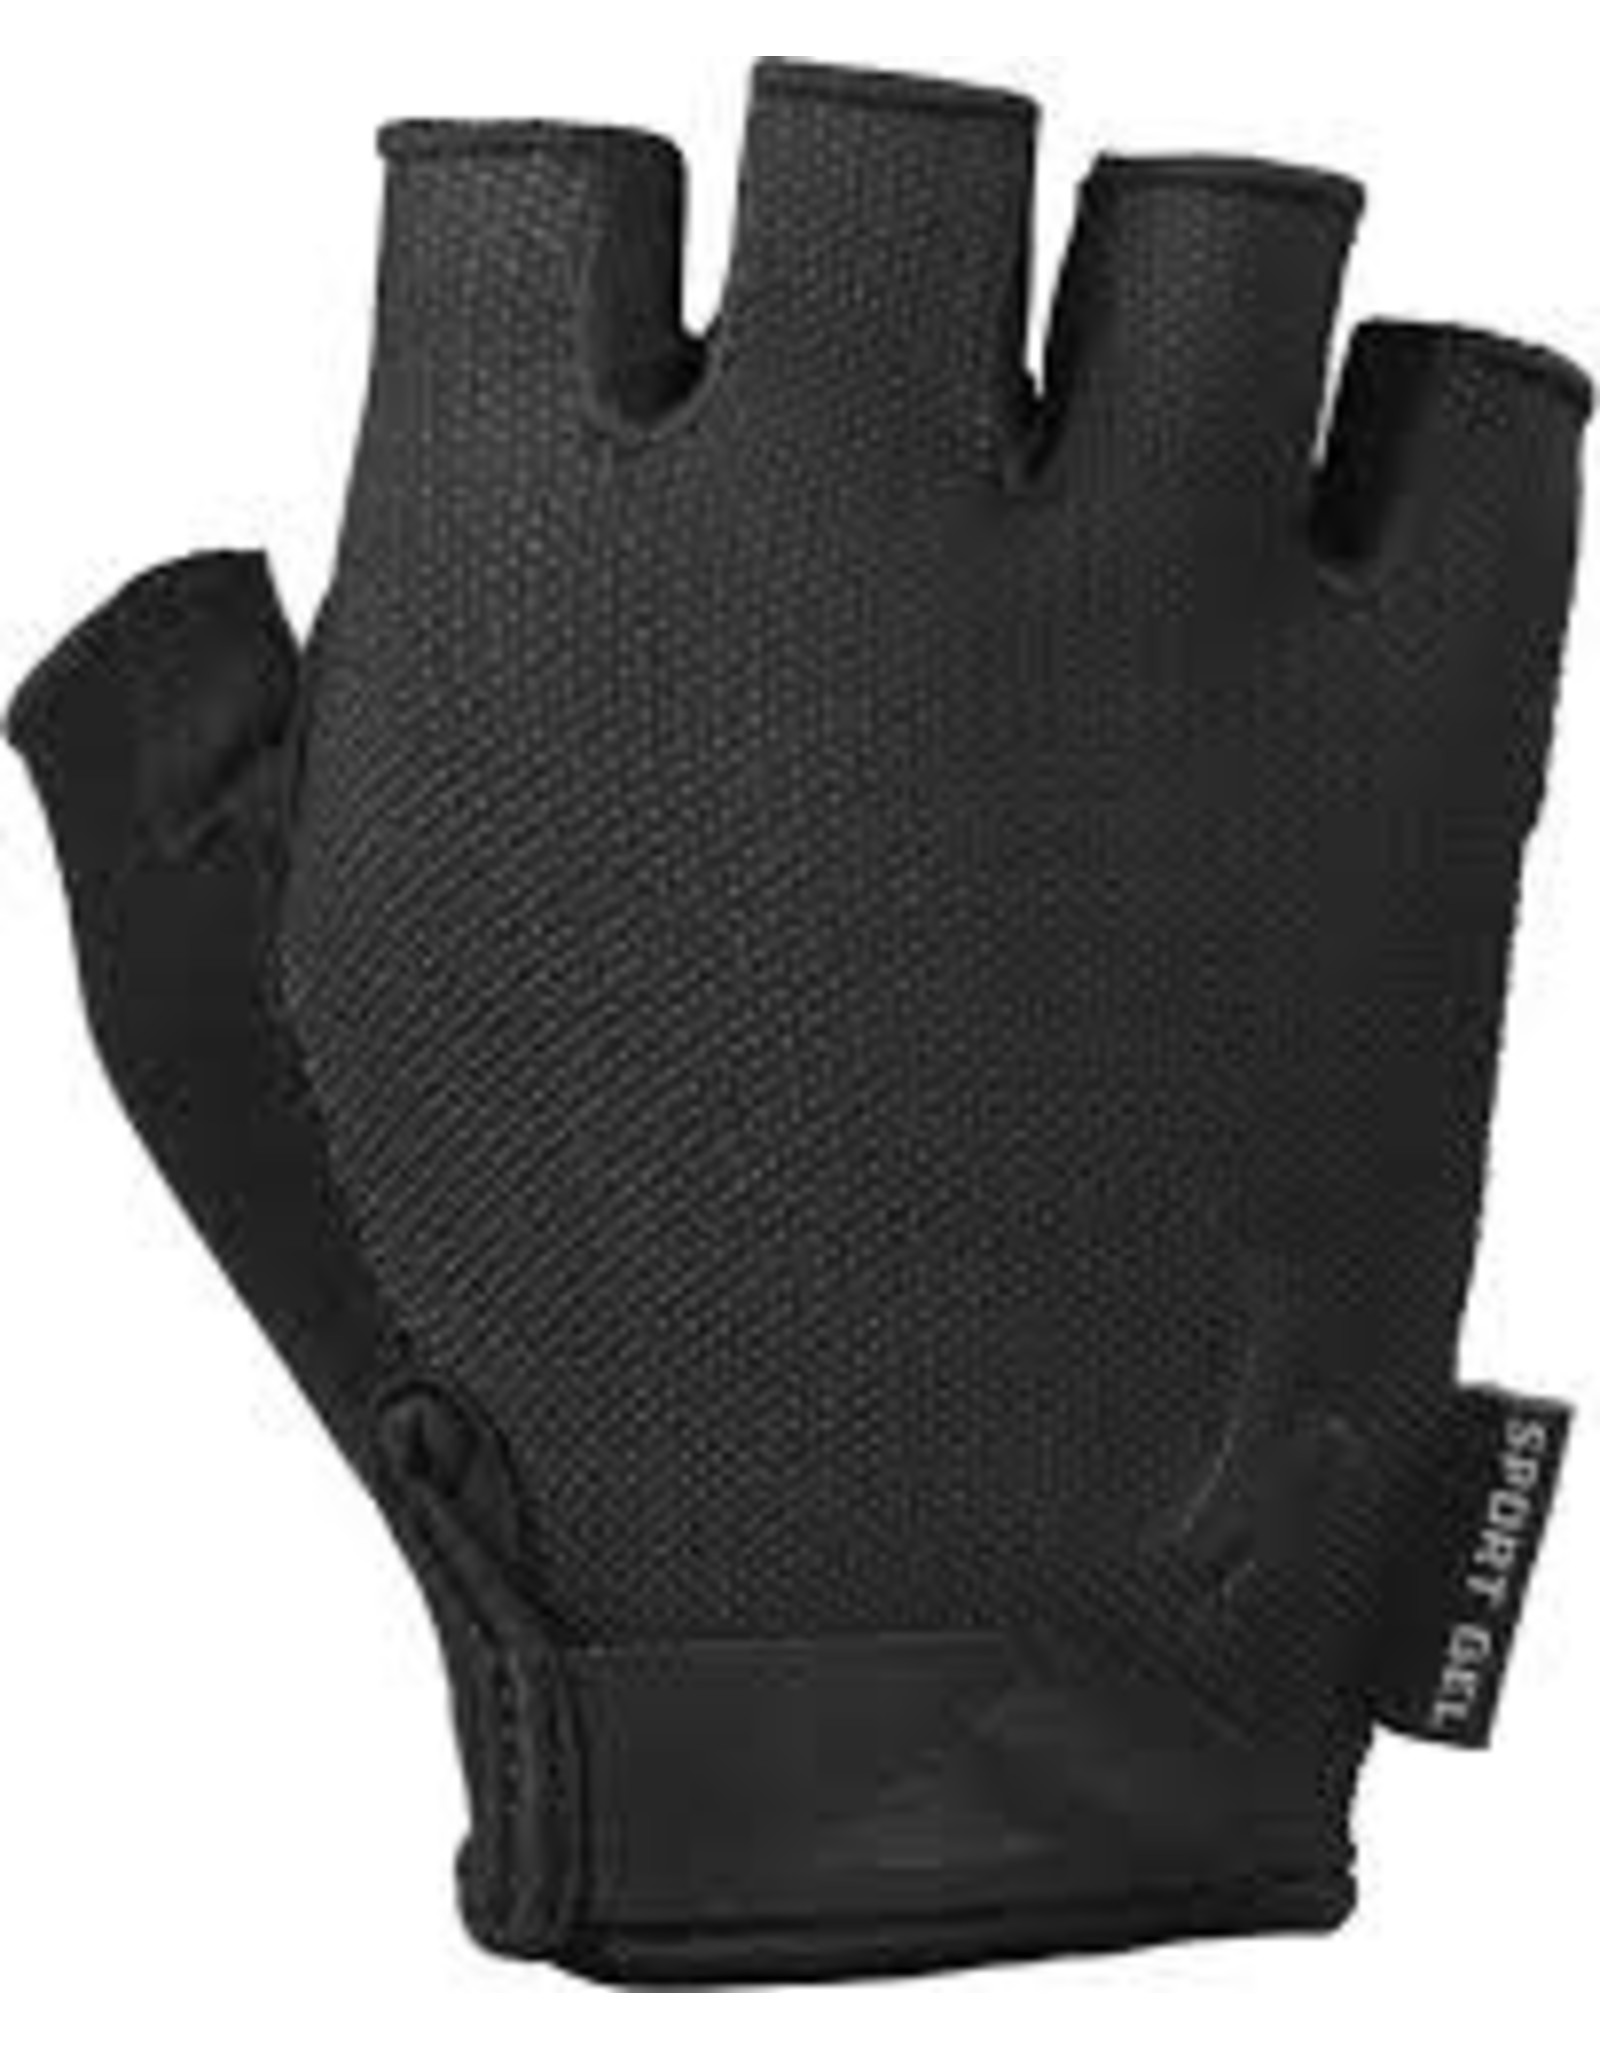 Specialized Glove Spec BG Sport Wmn Blk/Wht XL